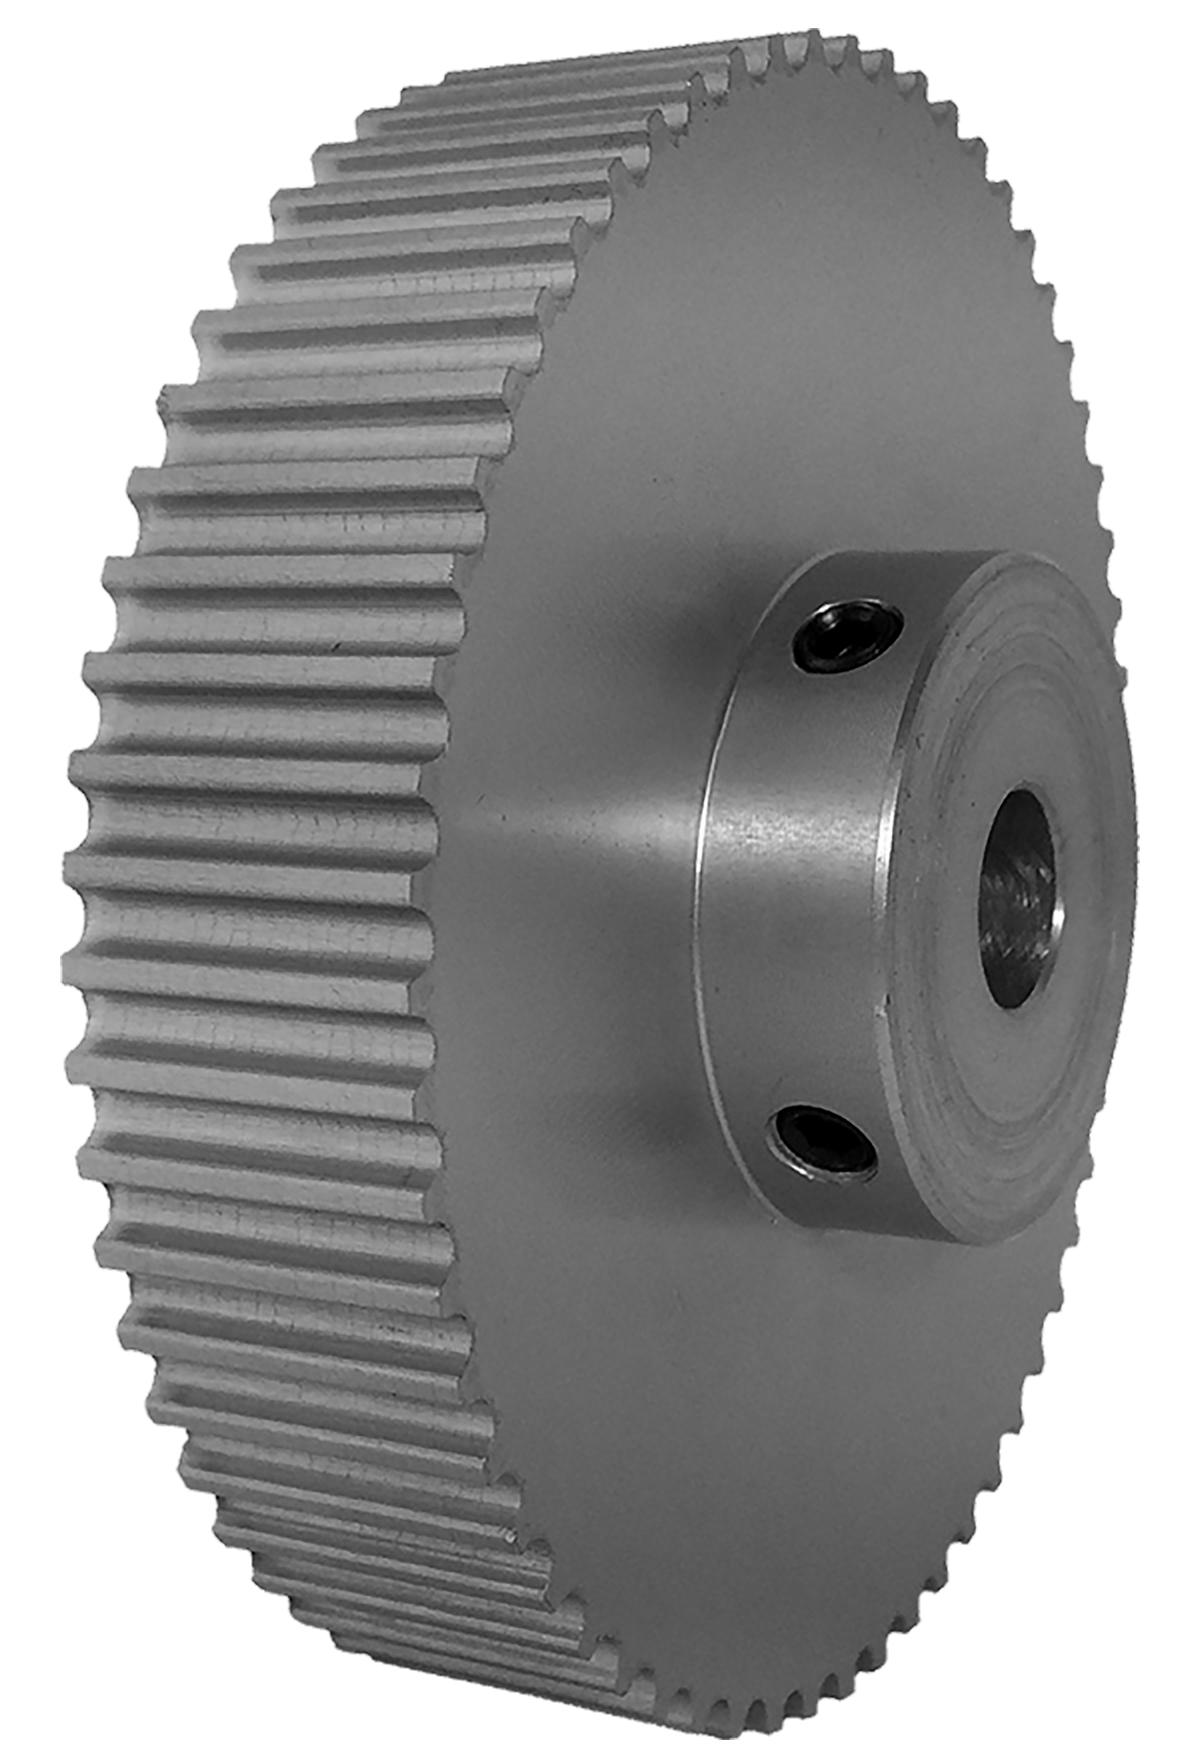 60-5M15M6A12 - Aluminum Powerhouse®HTD® Pulleys